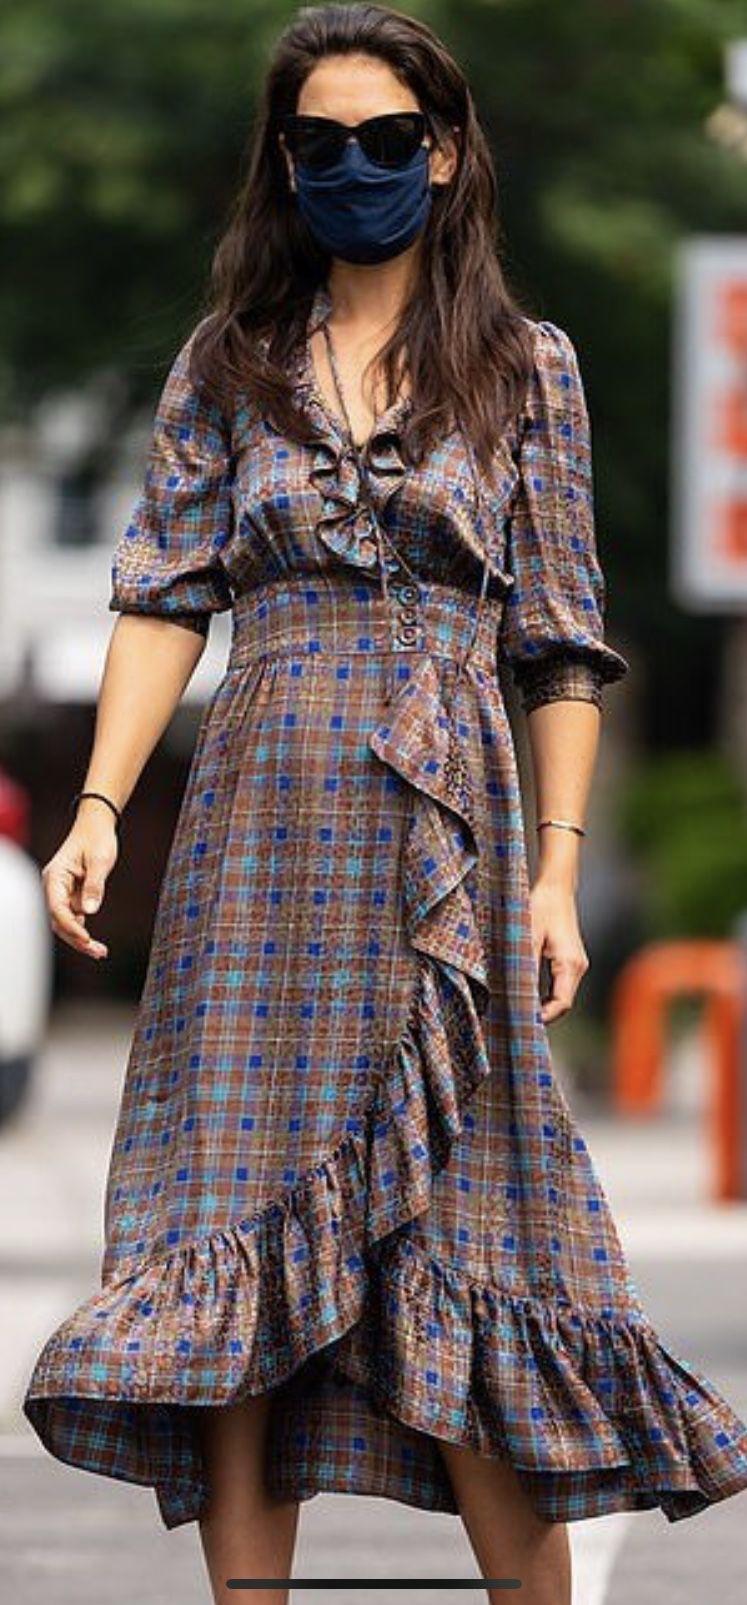 Pin By Wendy On Smashin Fashion In 2020 Dress Up Dresses Cruise Dress